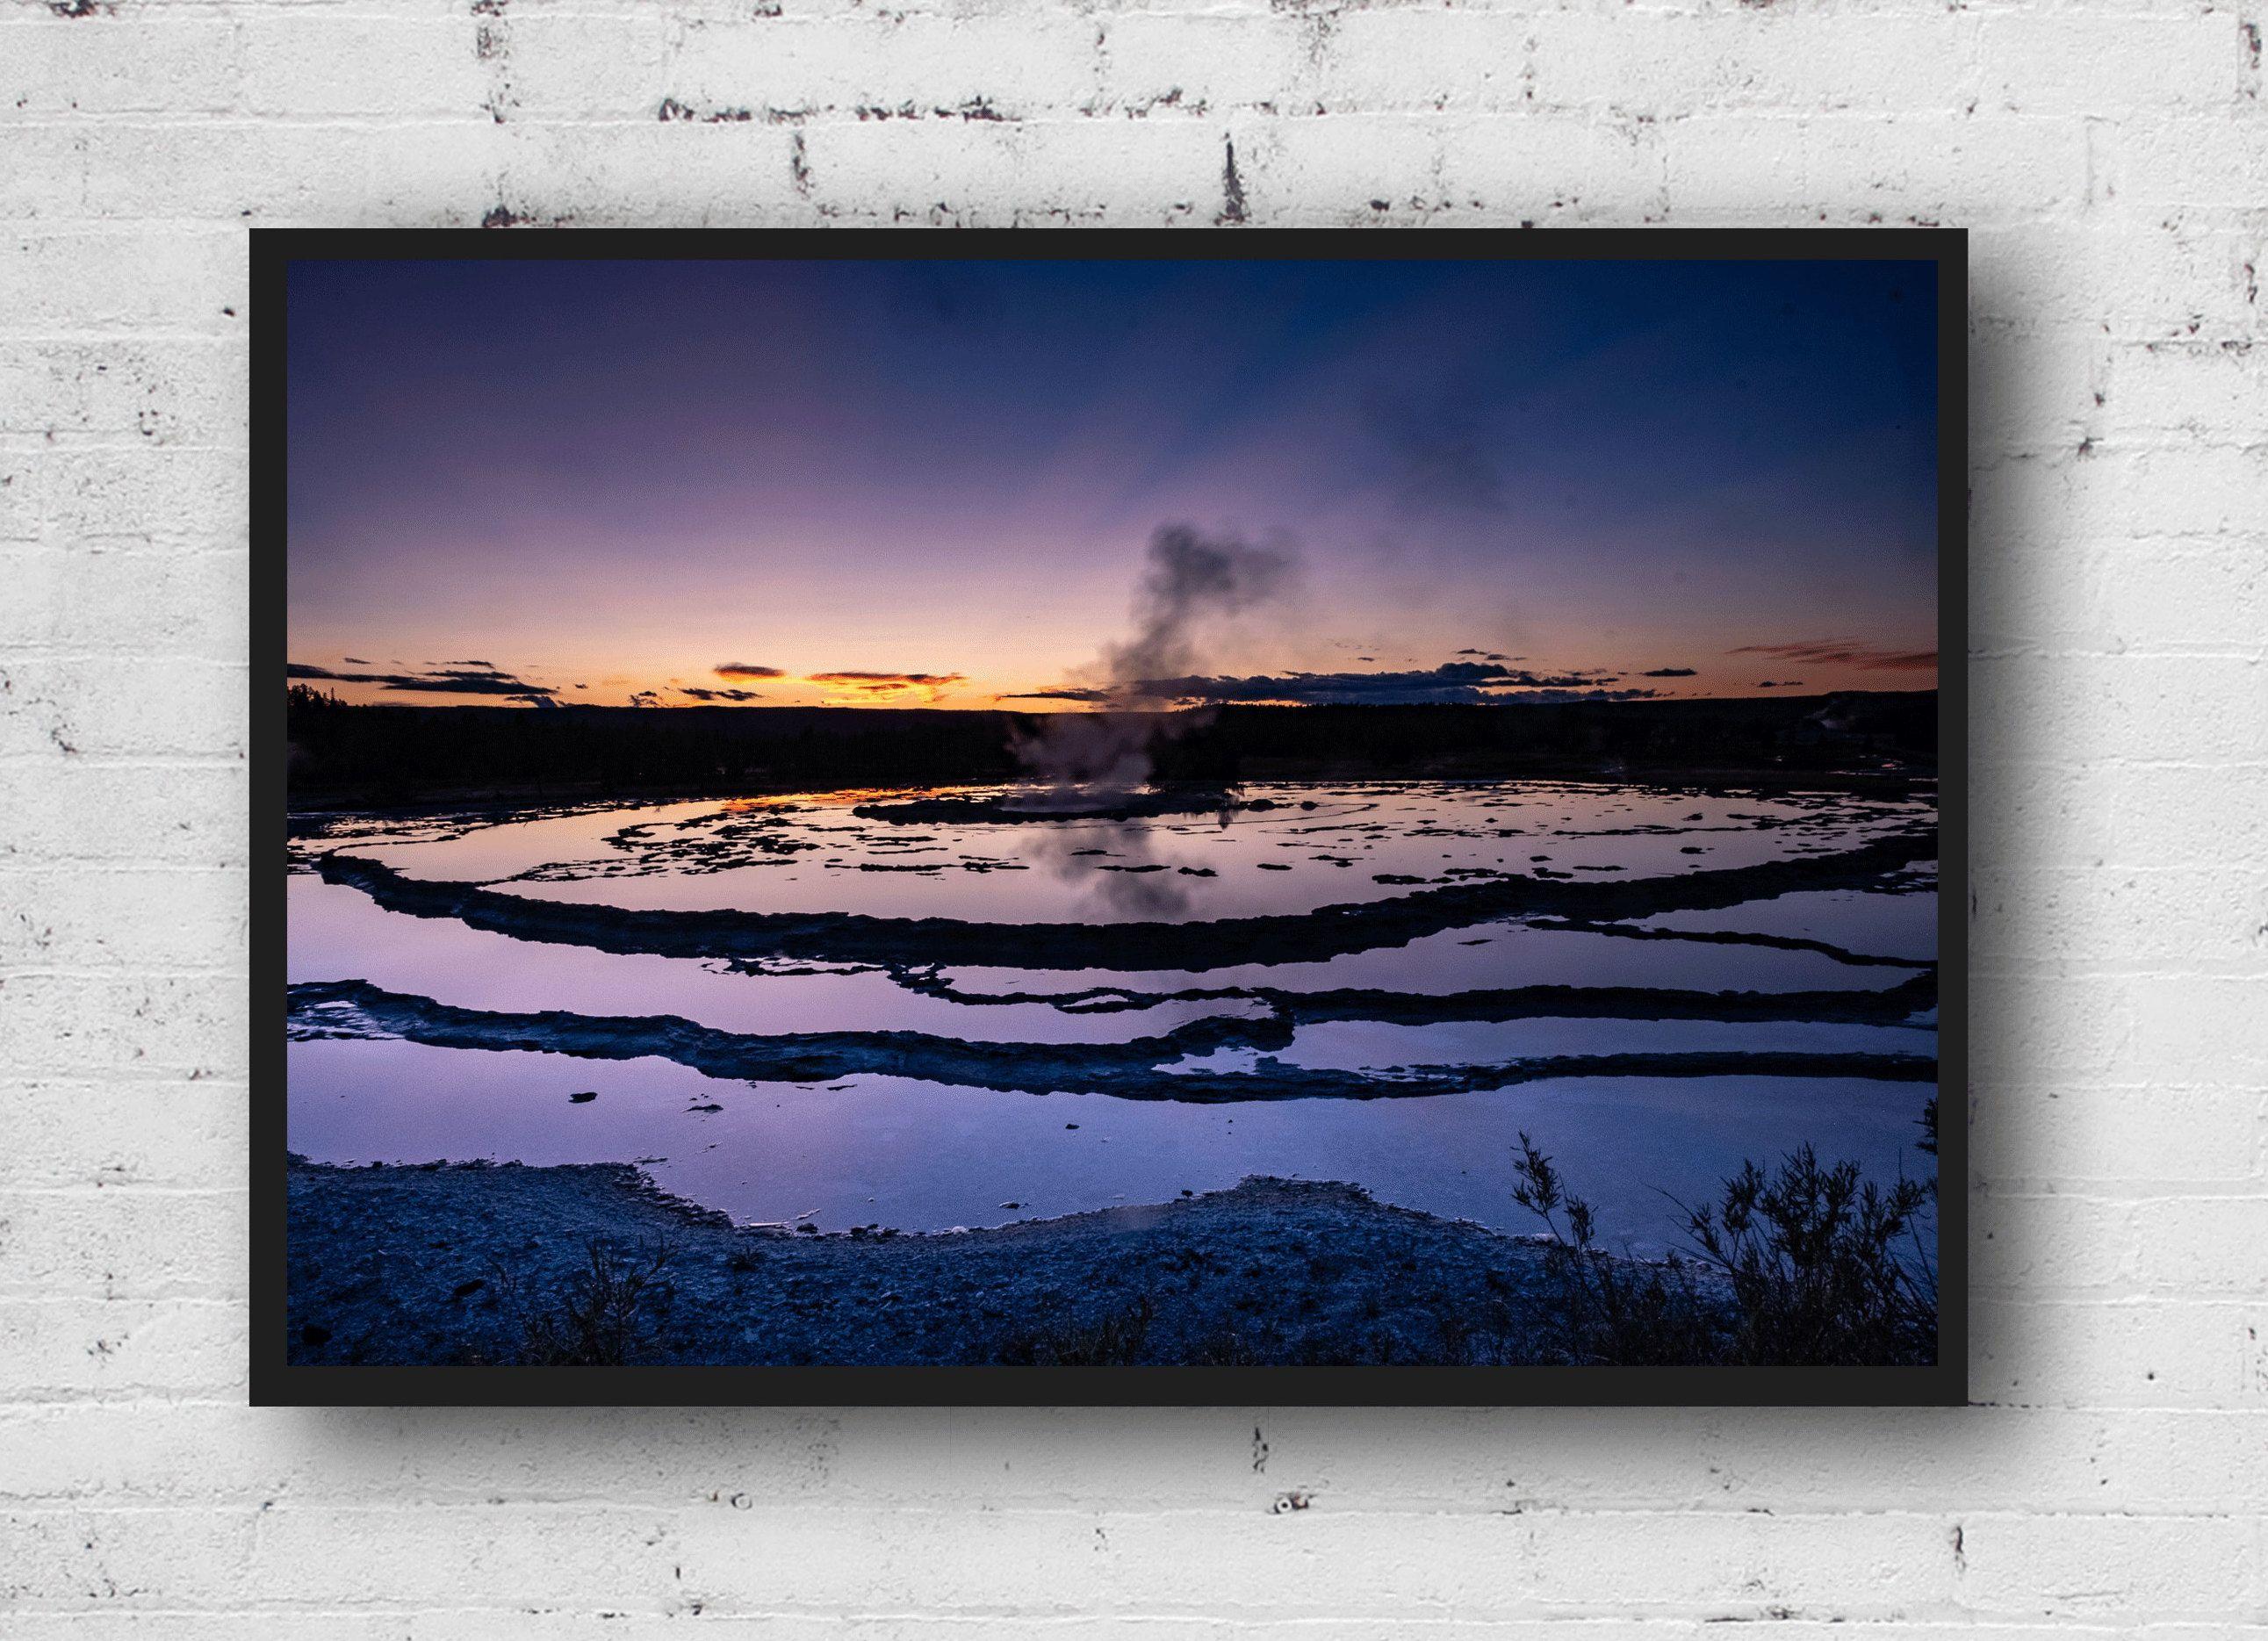 Yellowstone Print, Great Fountain Geyser, print wall art, Yellowstone Wall Art, Geyser Photo, Sunset Wall Art, usa landscape print #GeyserPhoto #YellowstoneSunset #ReflectionPhoto #FountainGeyser #YellowstonePhoto #YellowstoneDecor #SunsetPhotography #YellowstoneWallArt #NationalParkArt #NationalPark